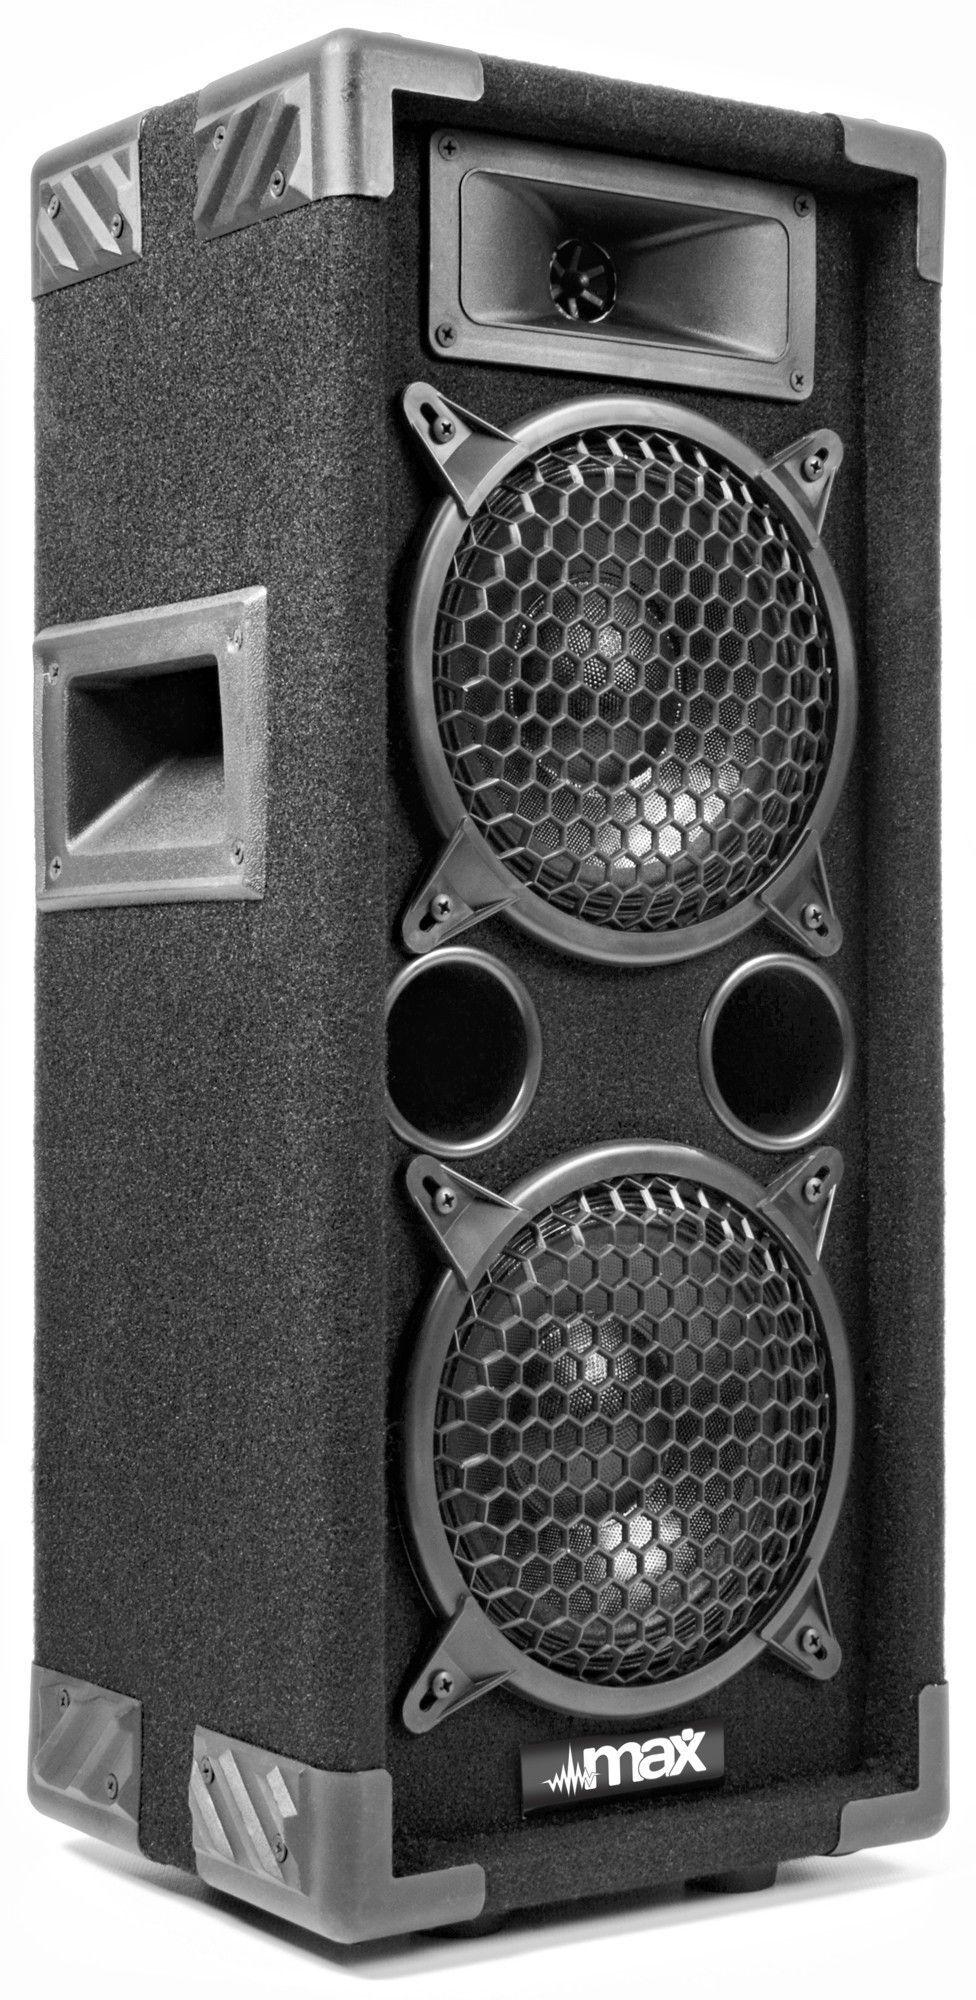 "Afbeelding van 2e keus - MAX Disco Speaker MAX26 600W 2x 6""..."